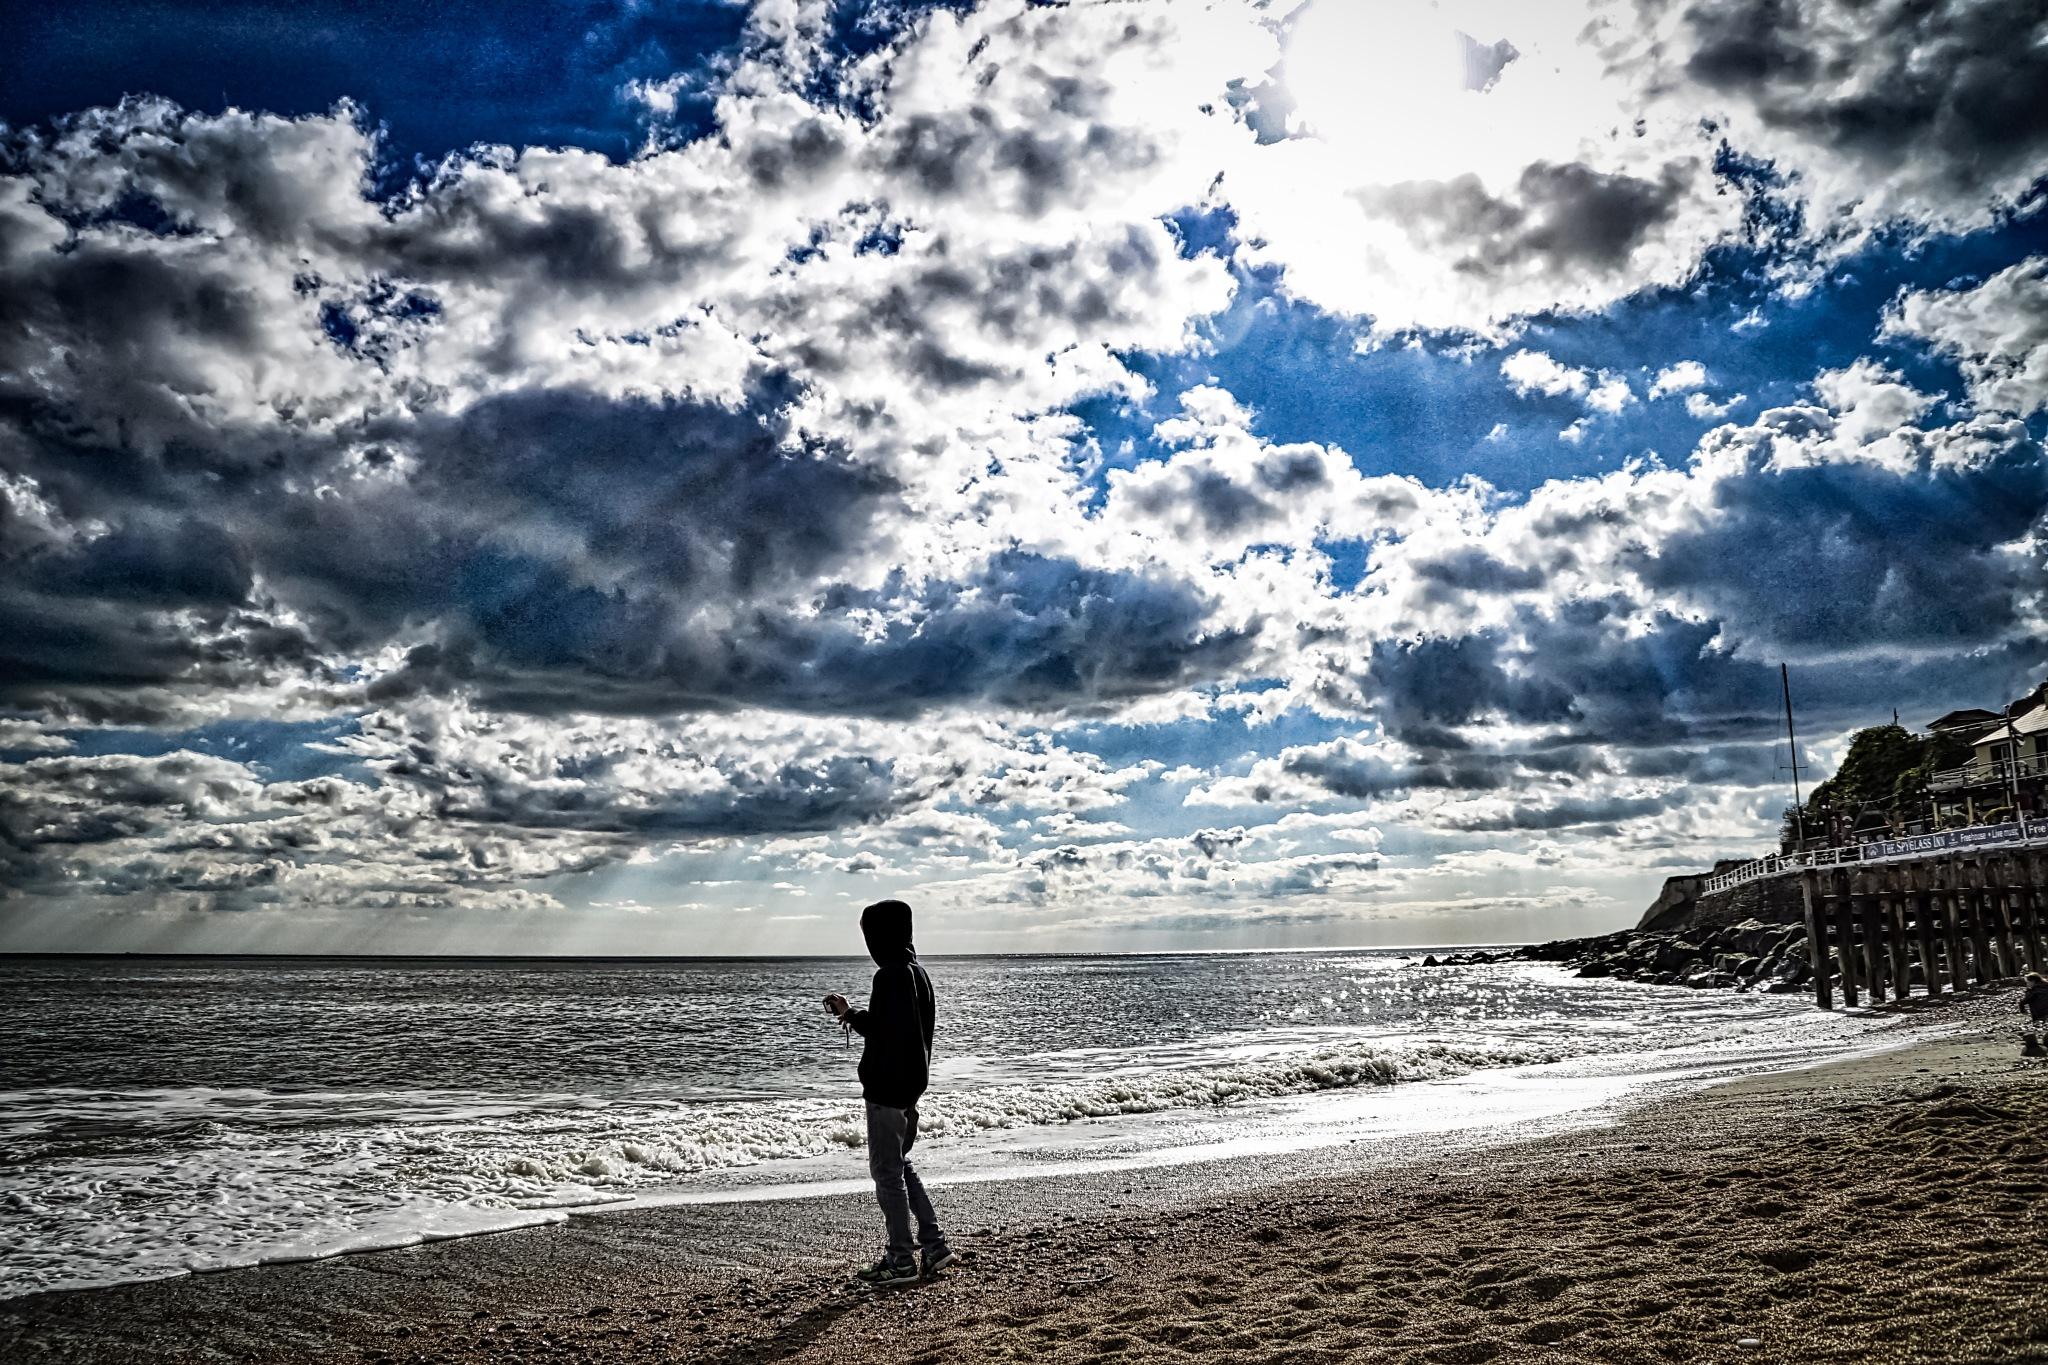 Beach by Slimboyfat